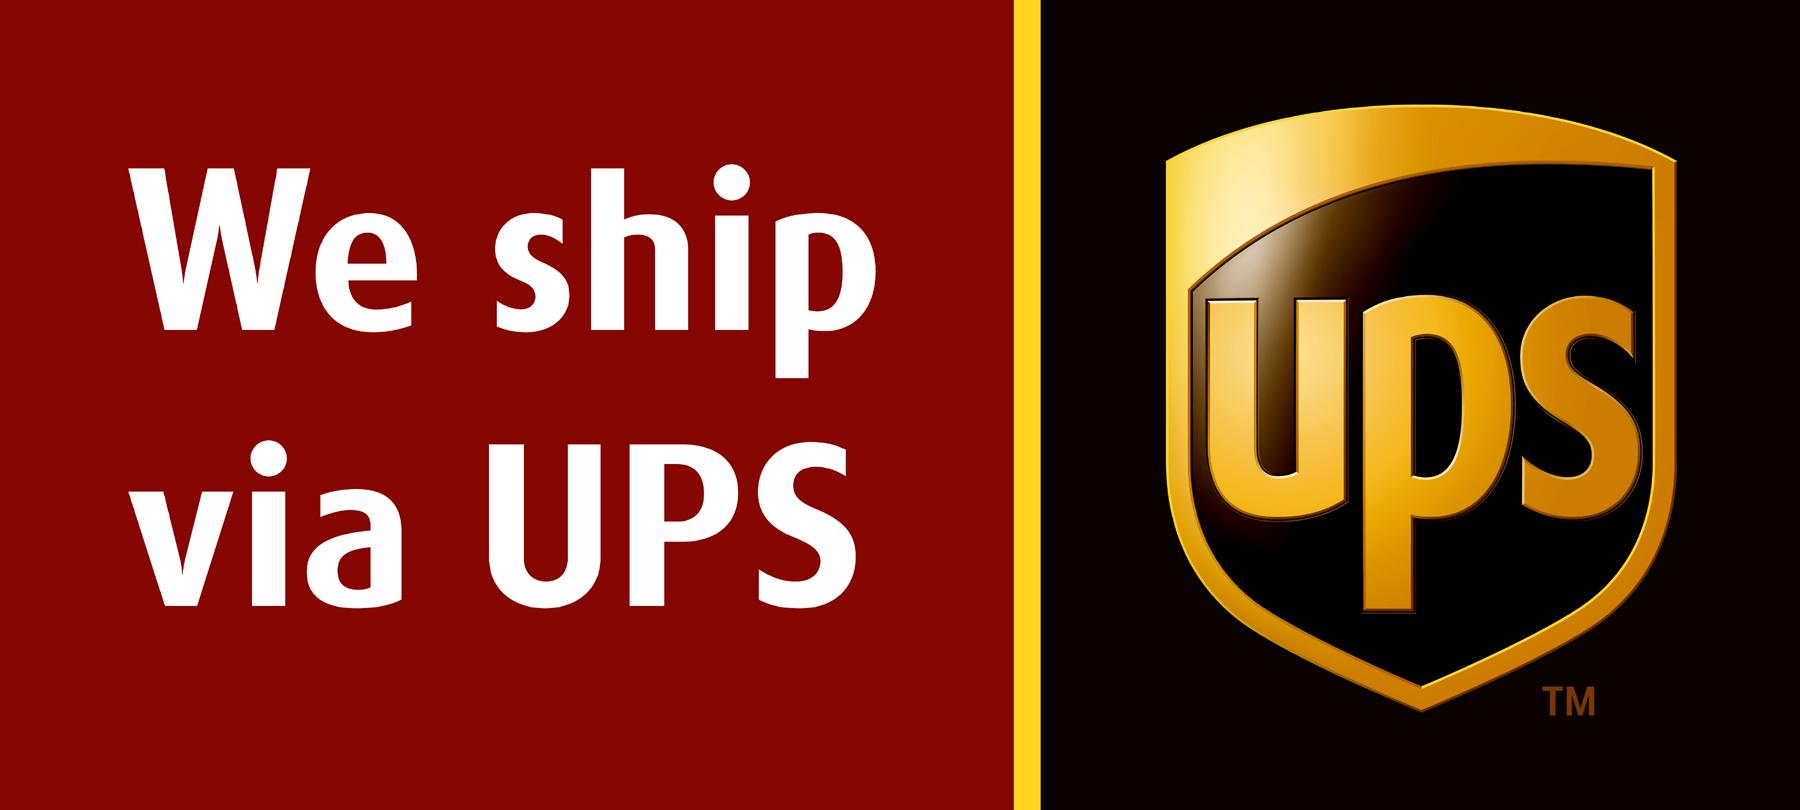 ups-logo-rc11.jpg